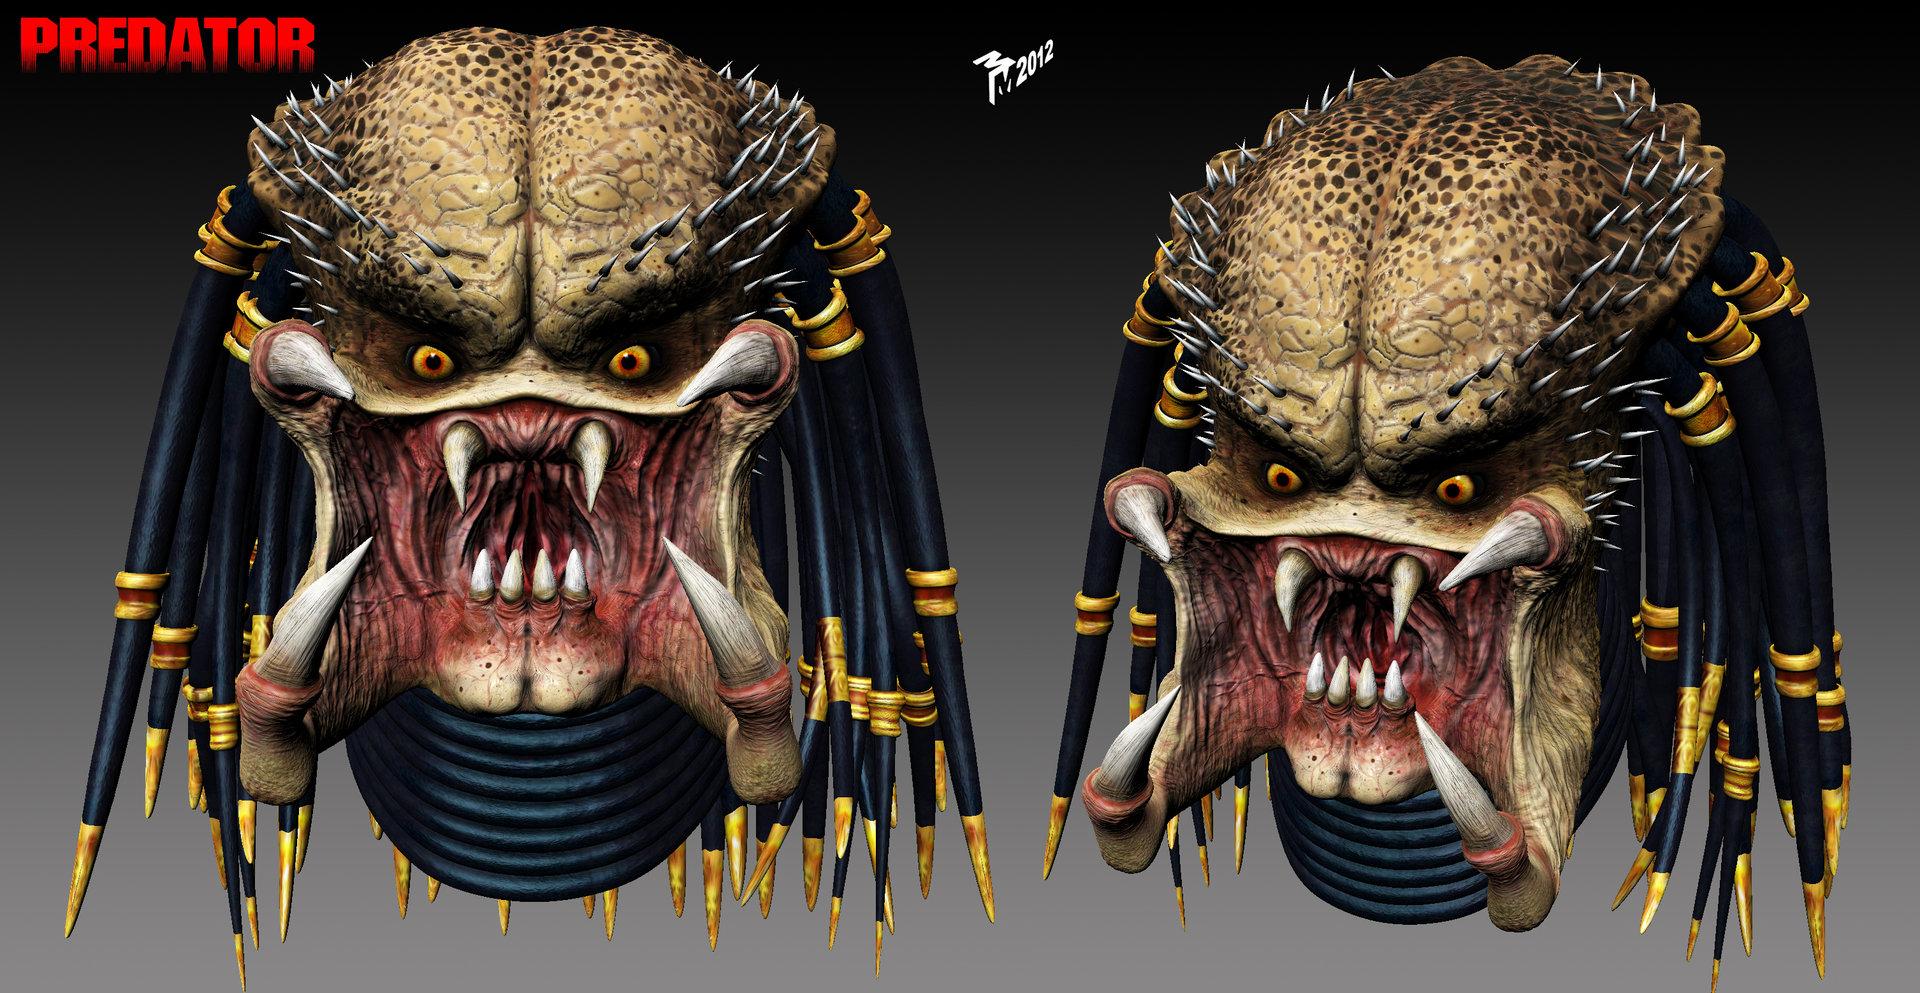 mark-armstrong-rand-predator.jpg?1417605393